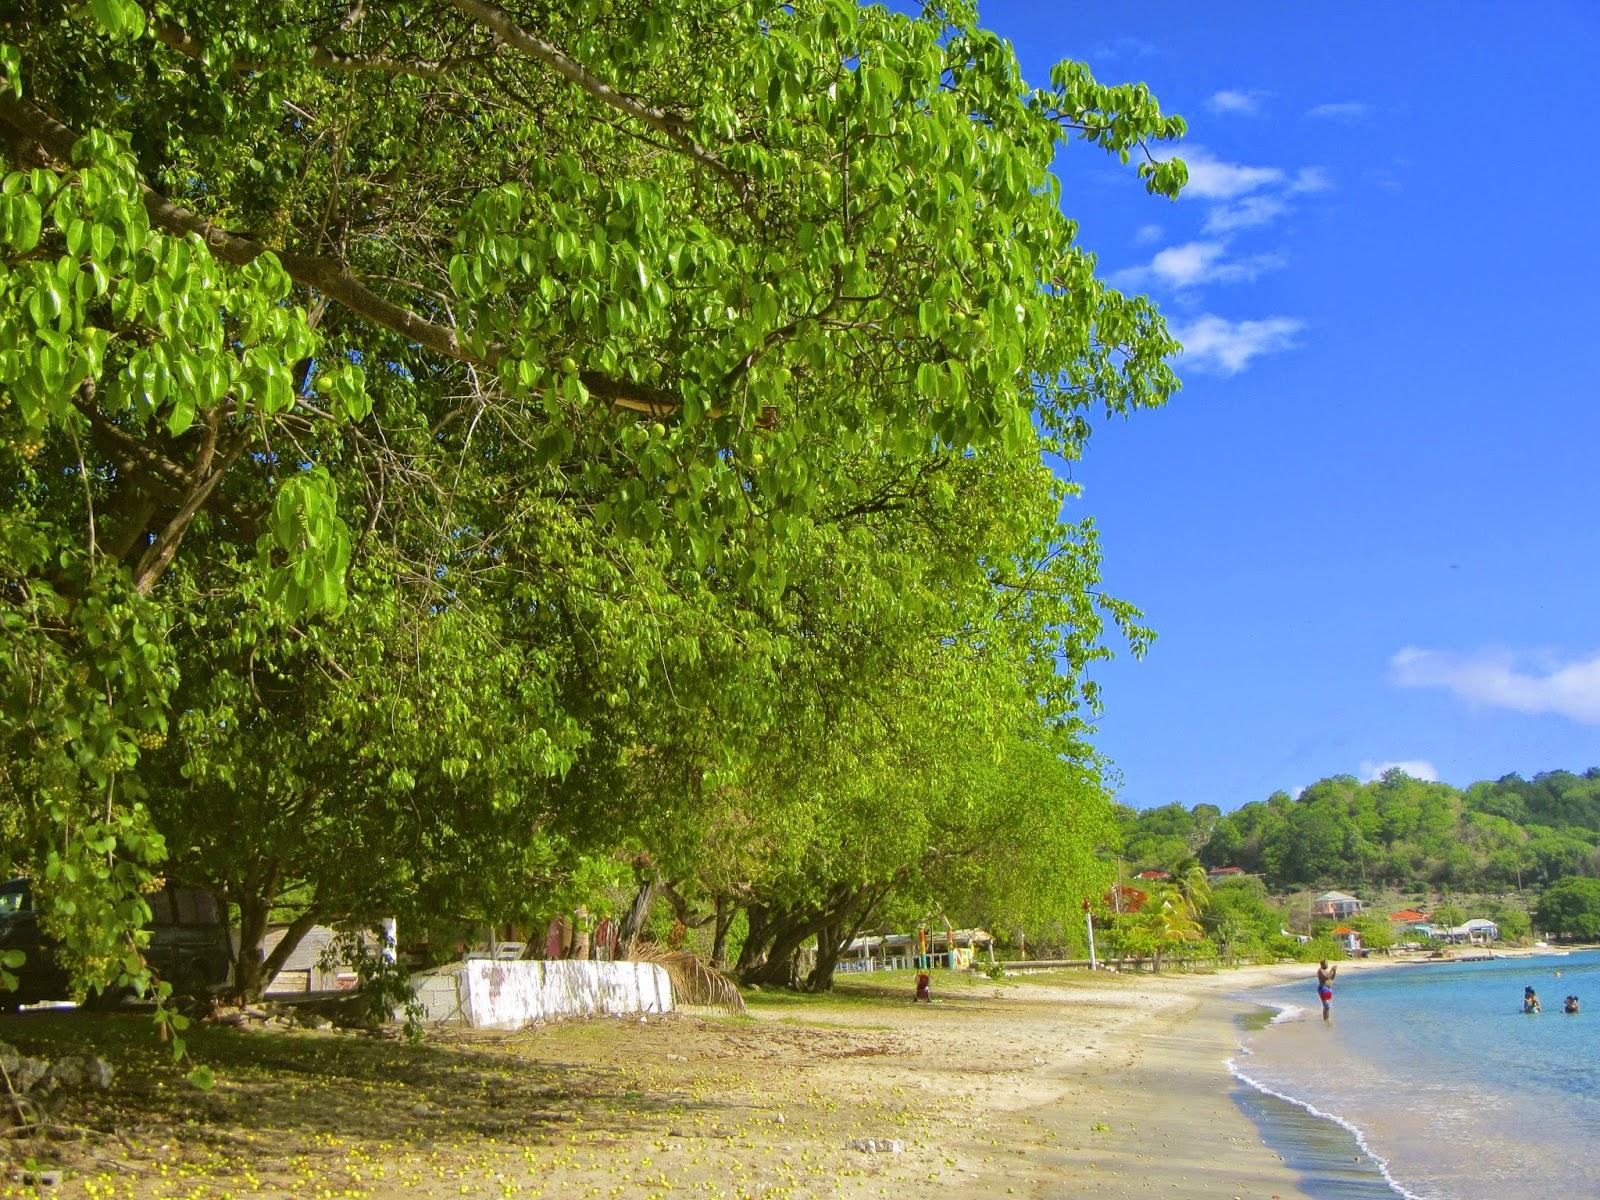 Manchineel trees